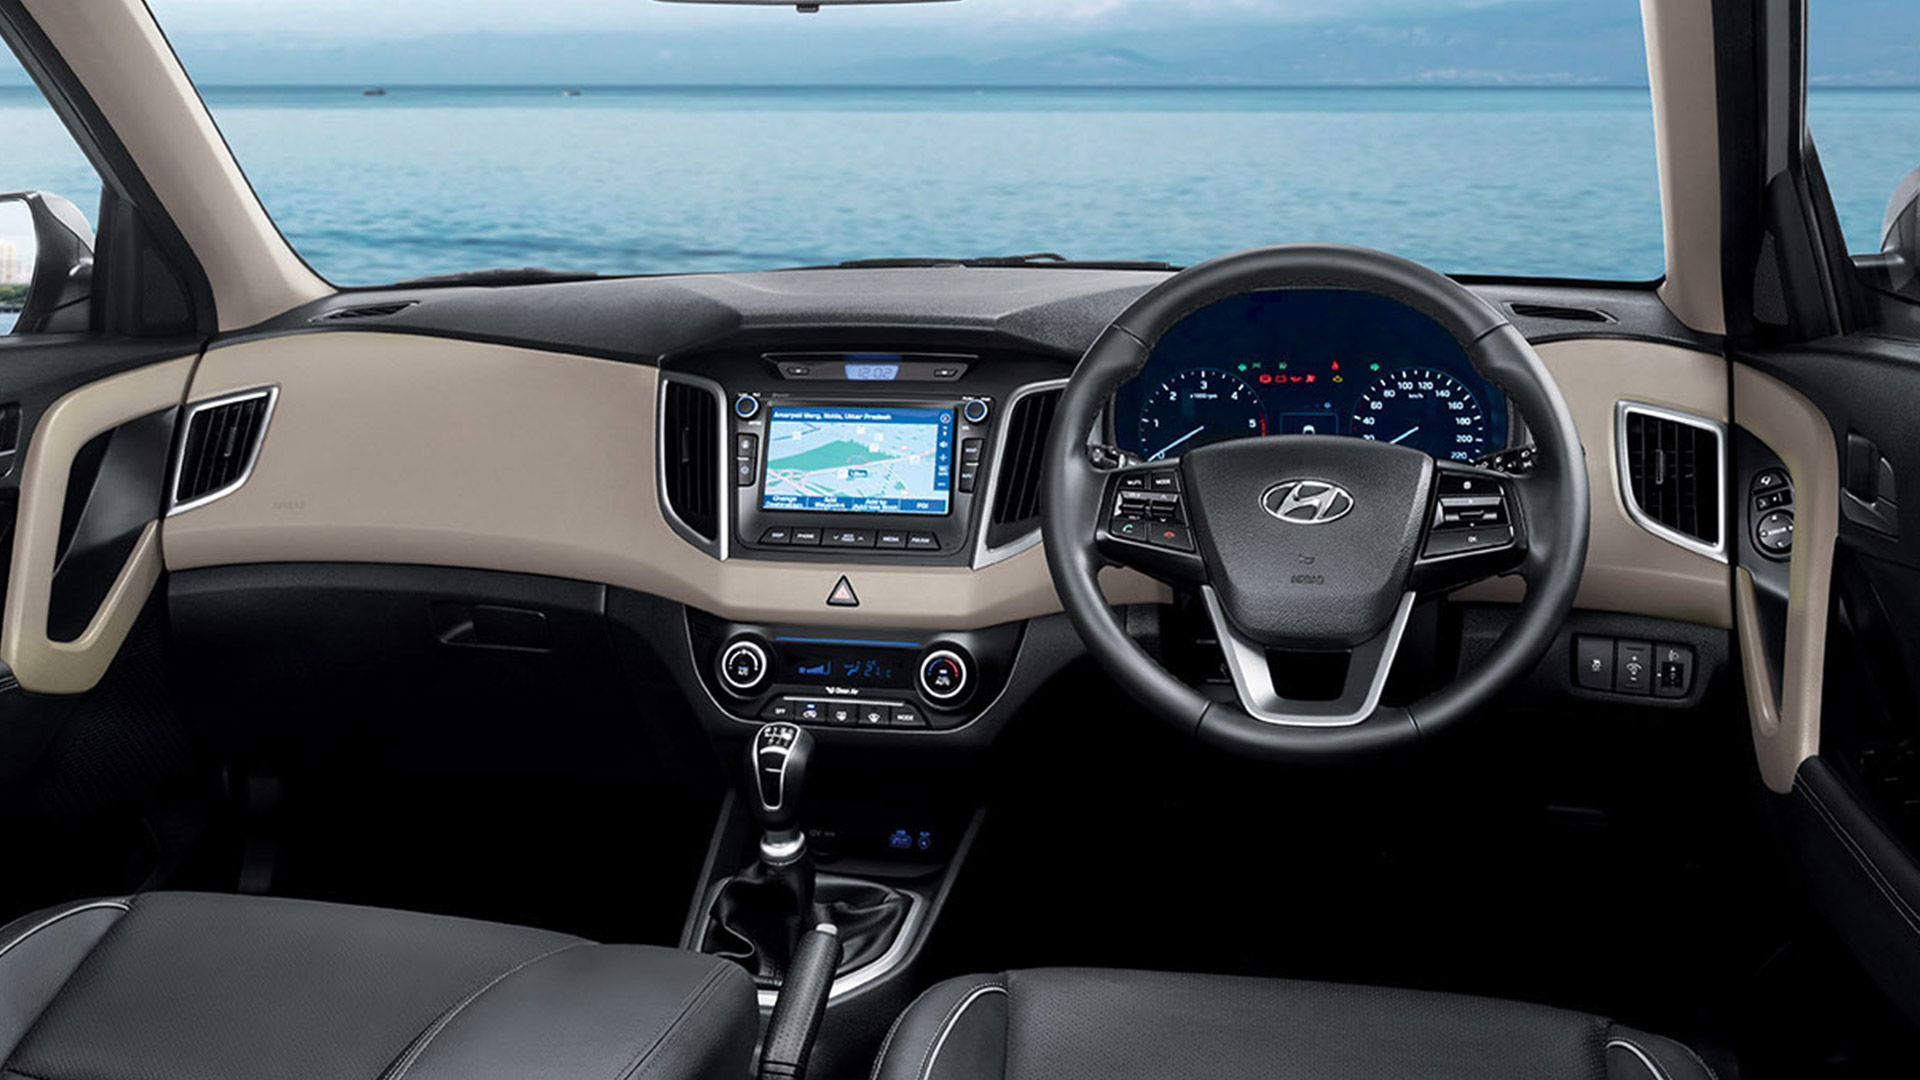 Hyundai Creta 2015 1.6 S Petrol Compare